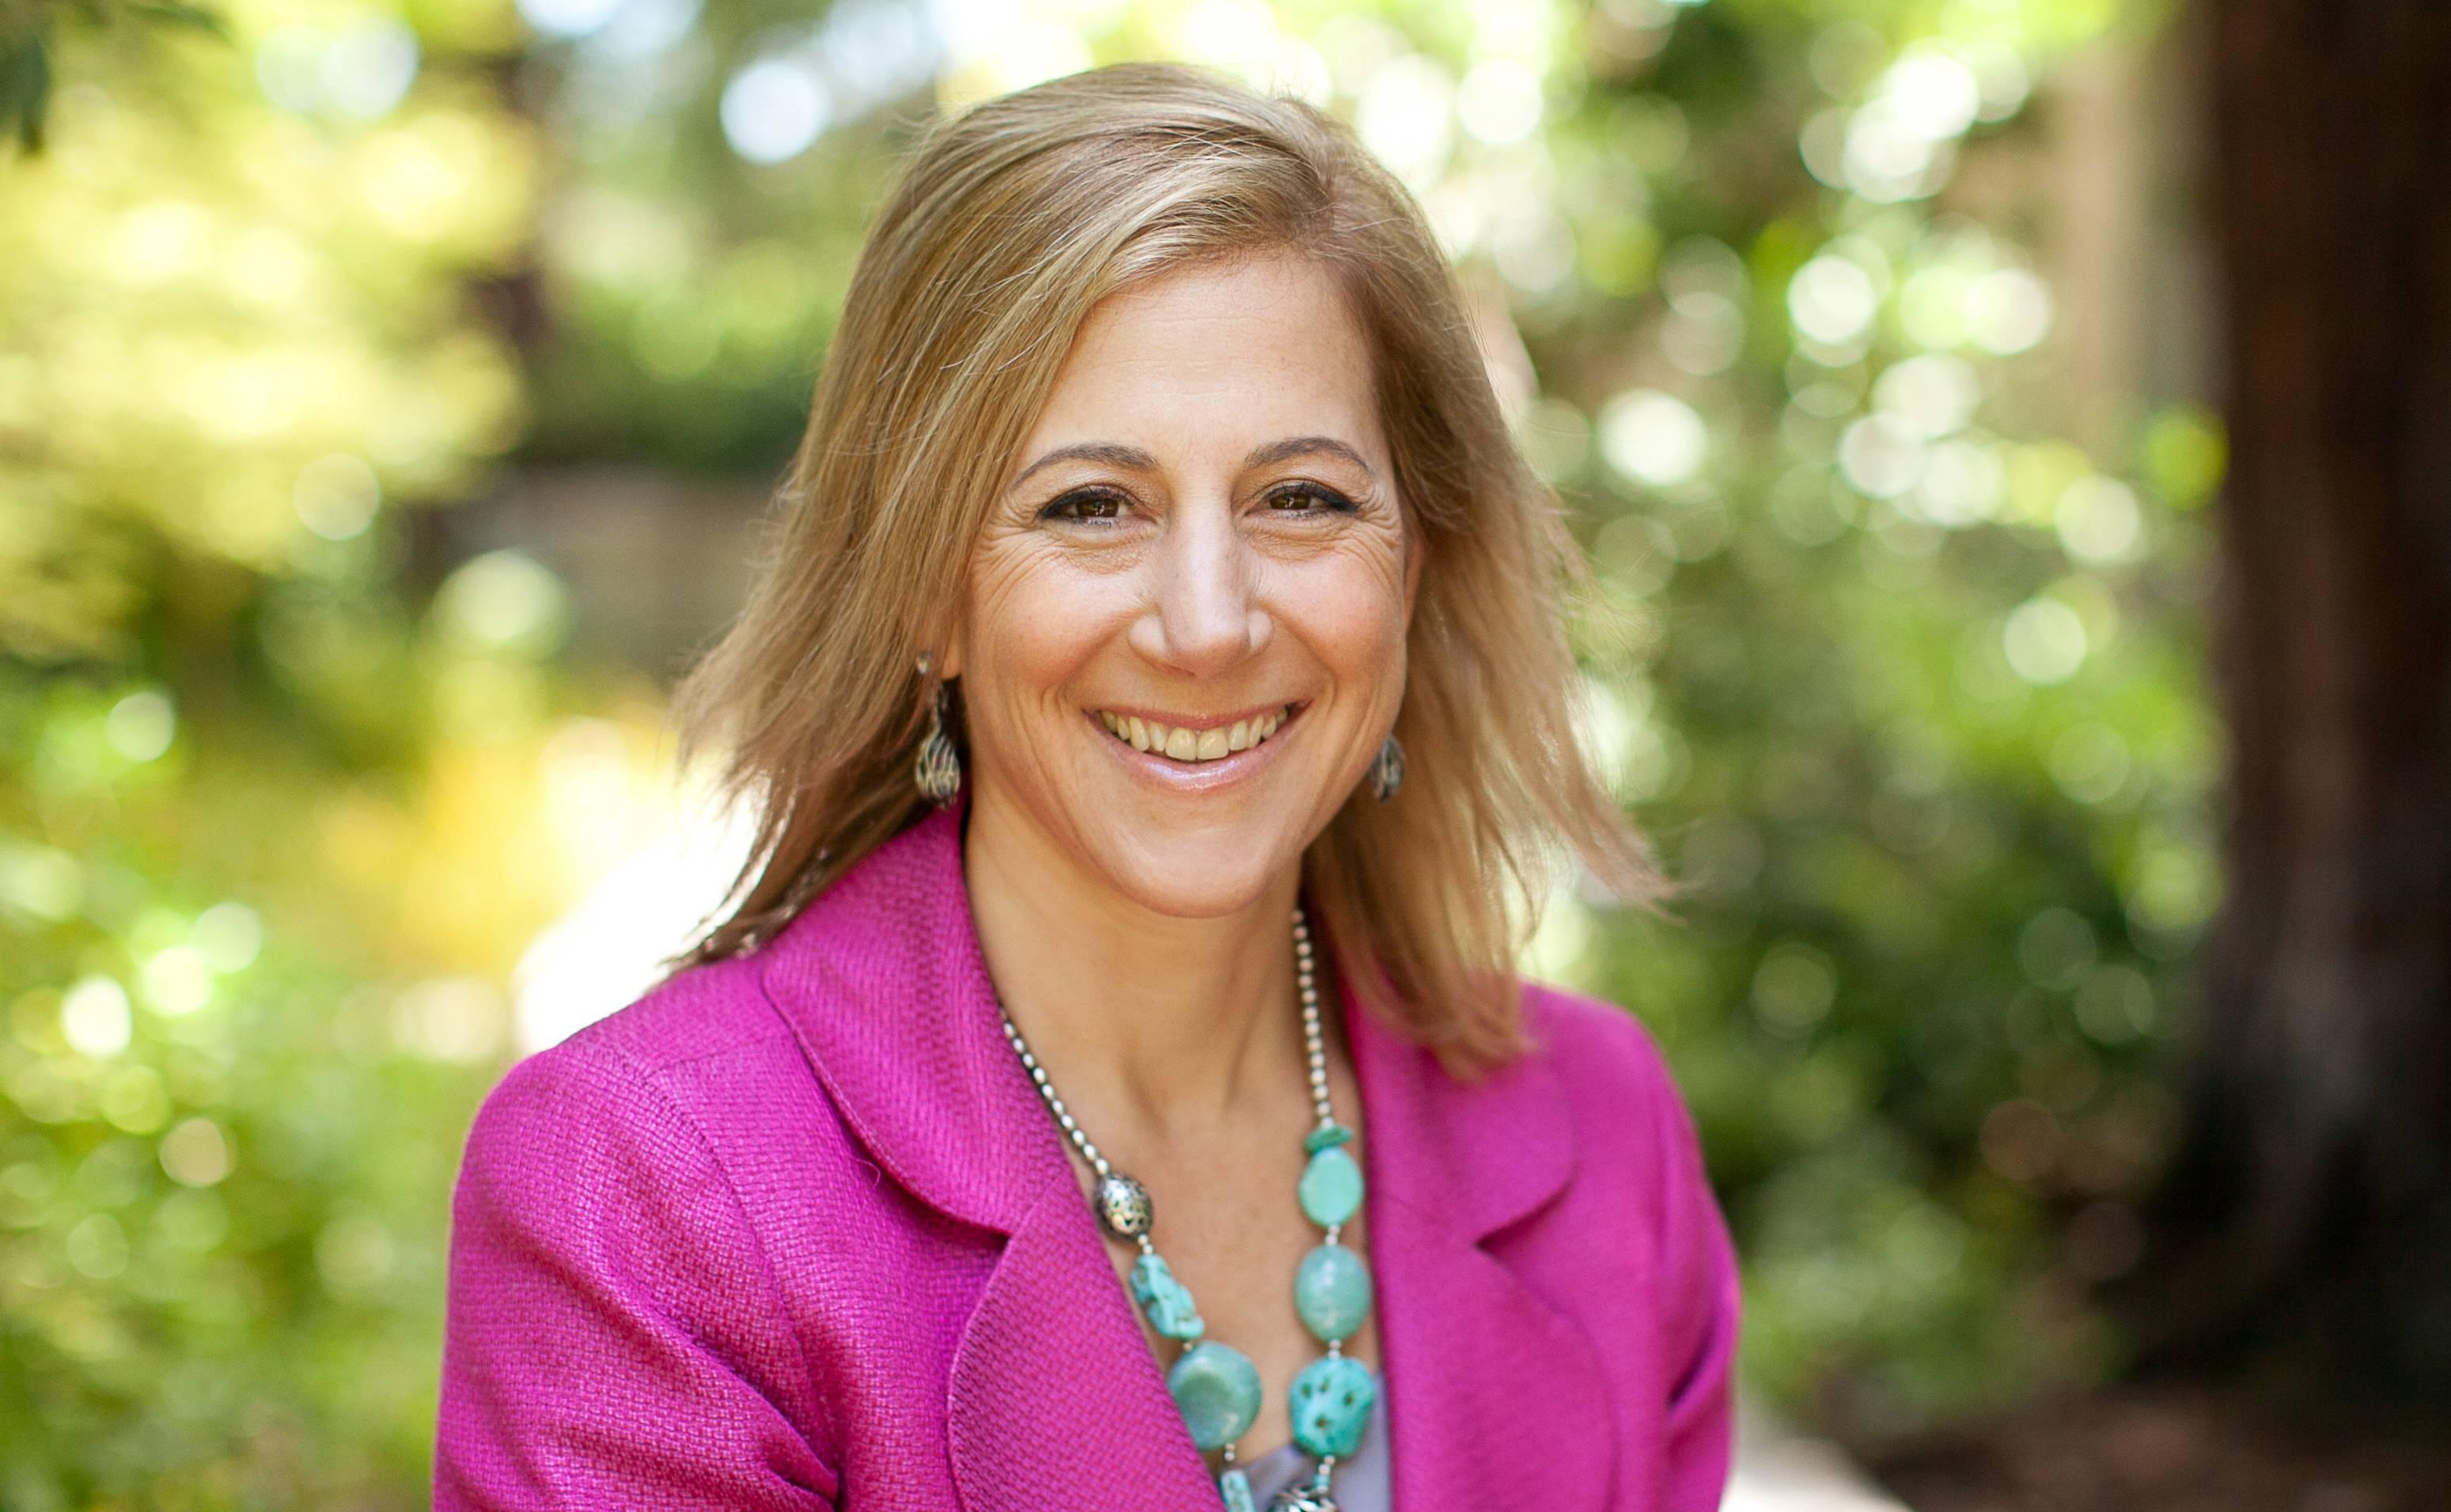 Stephanie Tilenius, founder of Vida Health